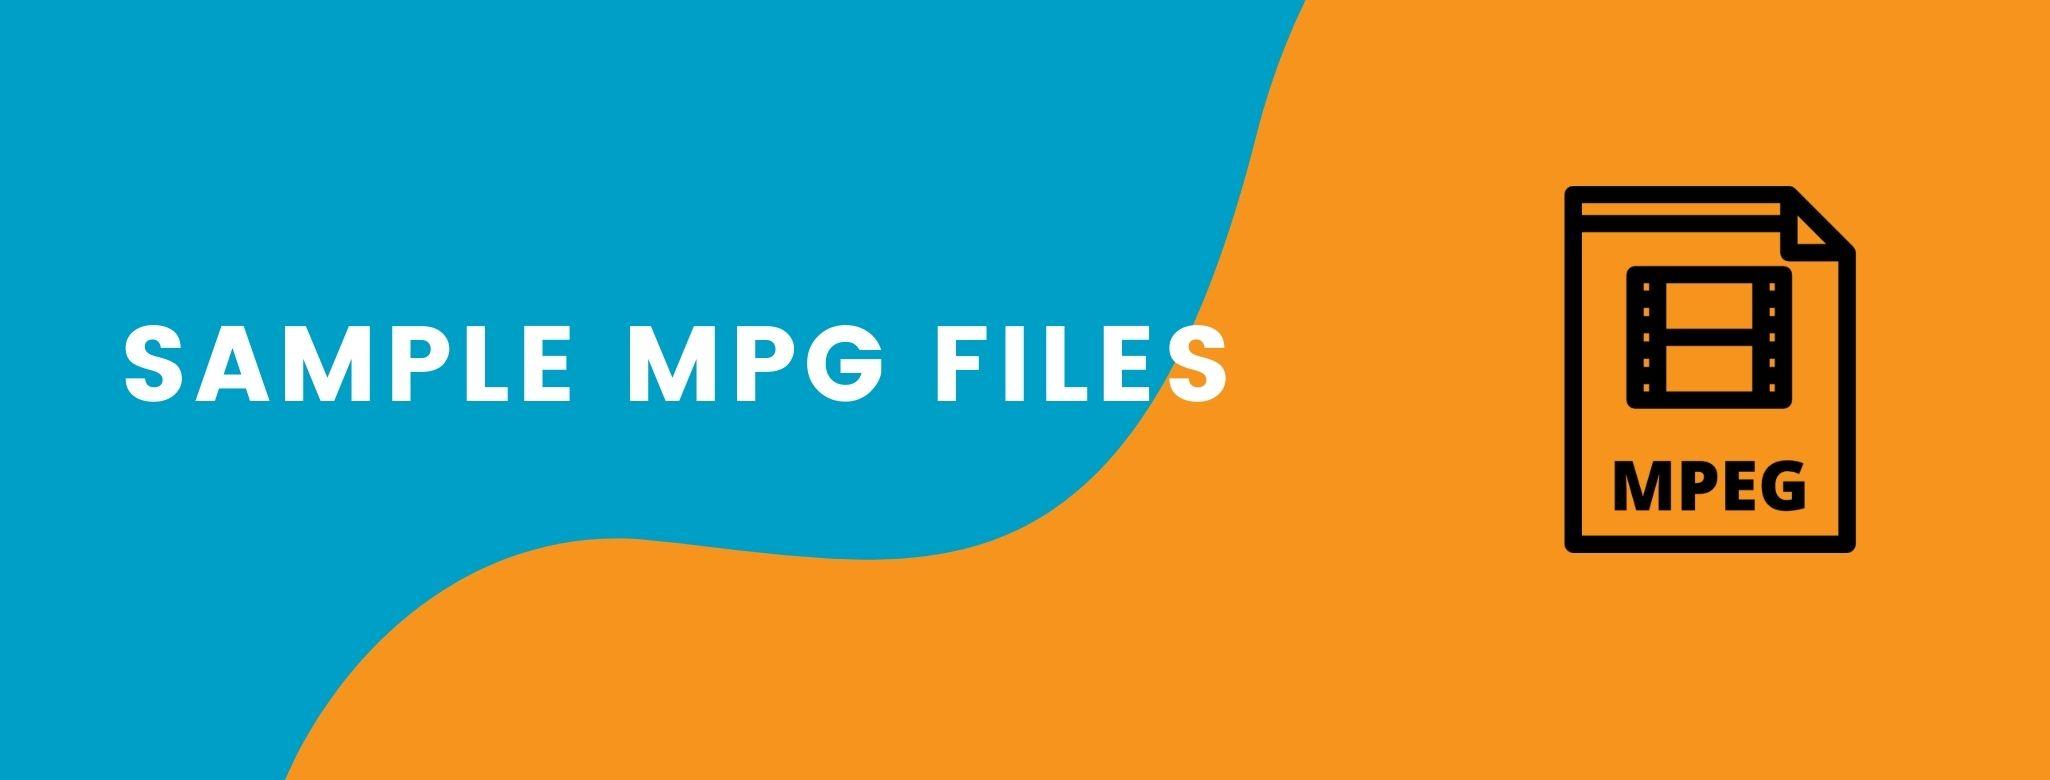 Sample MPG File